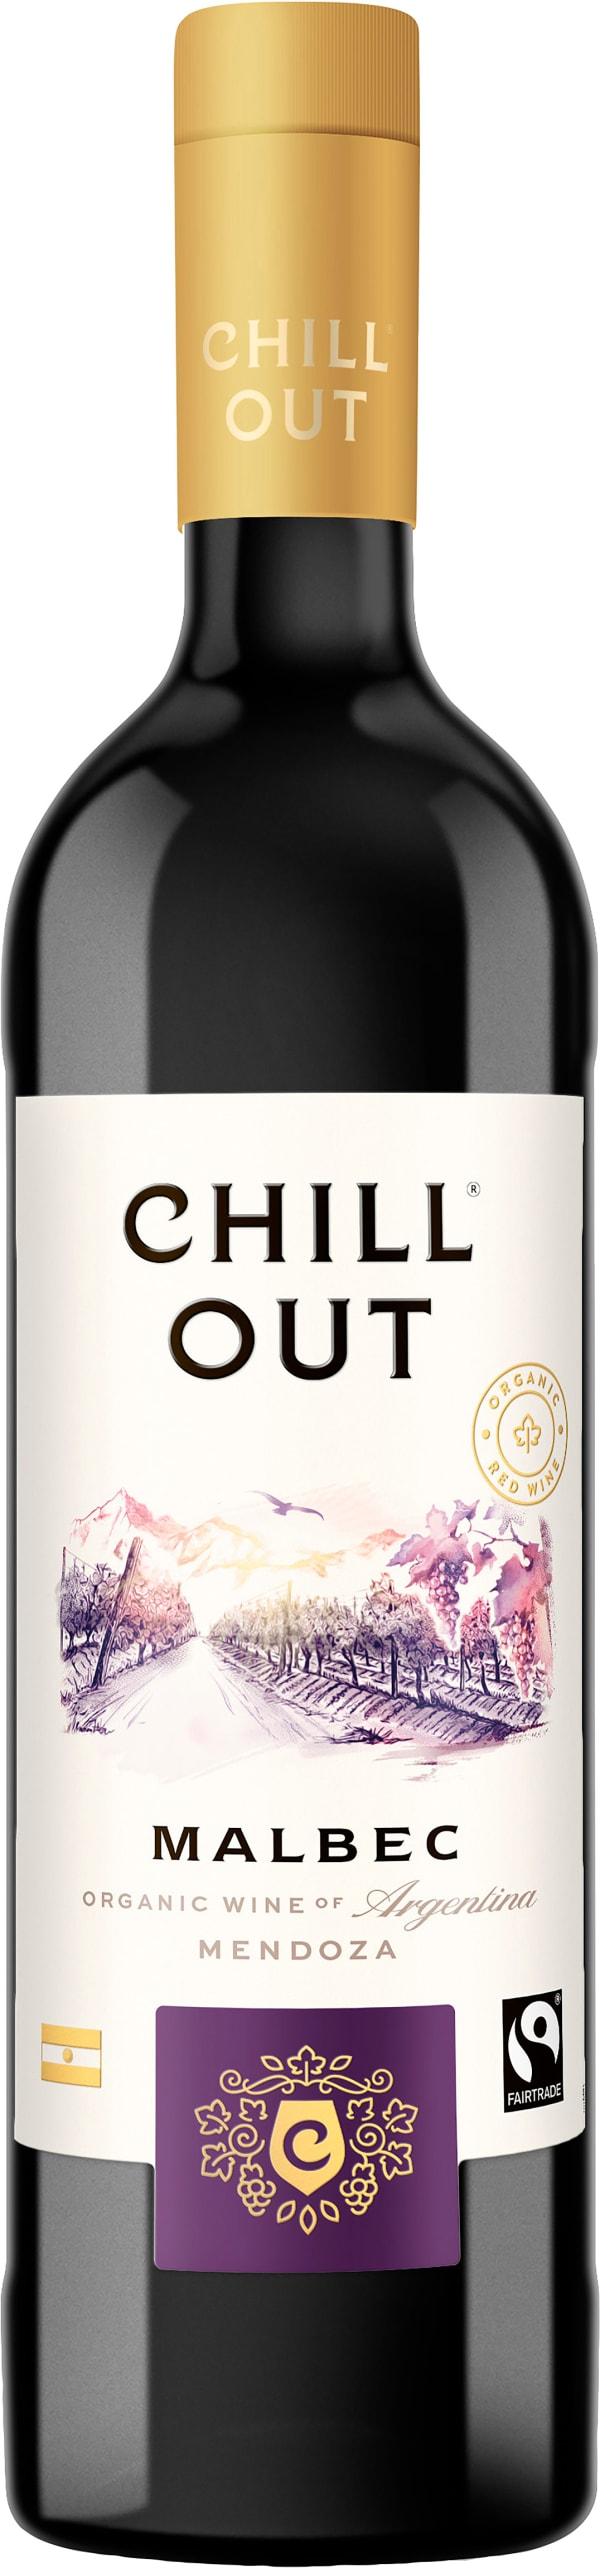 Chill Out Malbec Argentina 2017 plastflaska